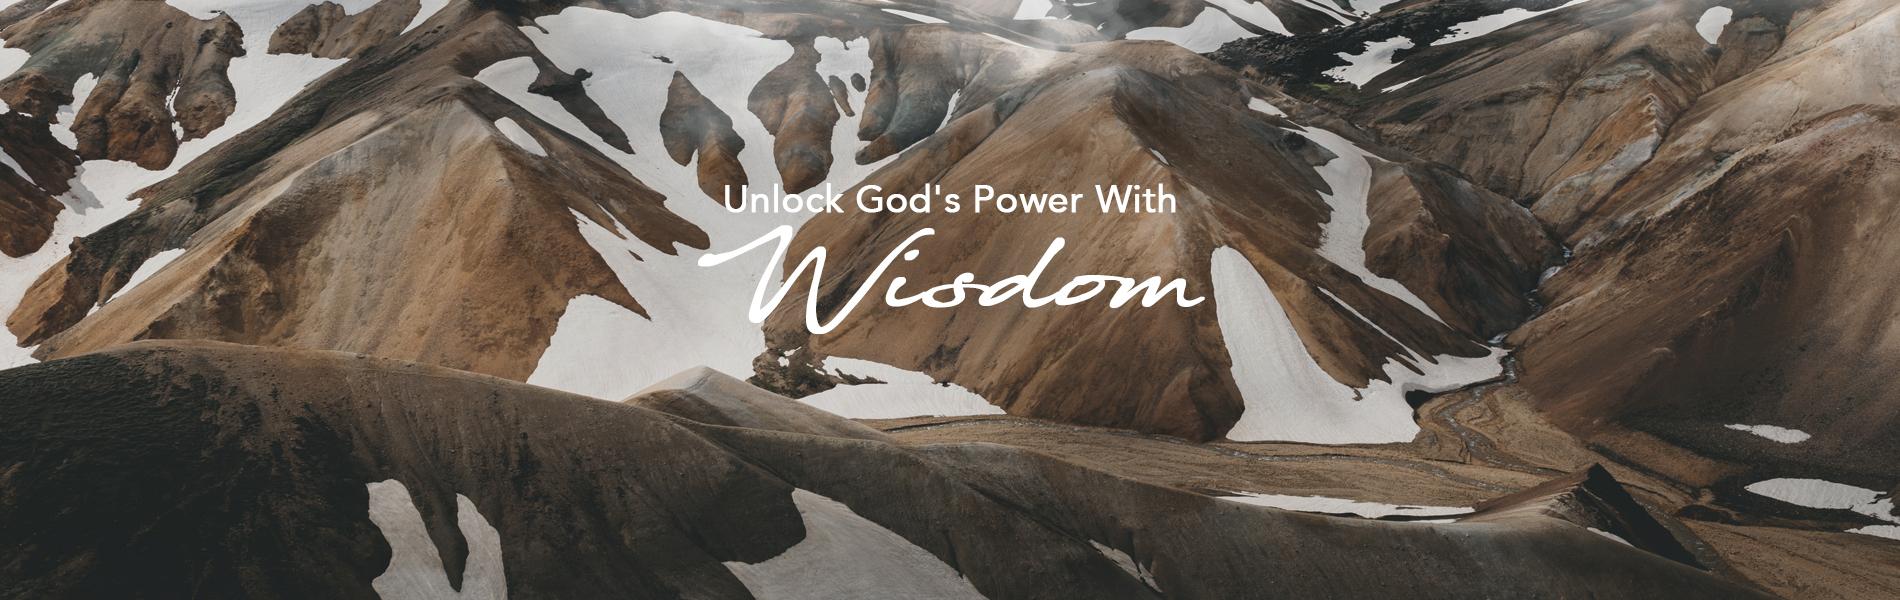 2019_08_Aug_Unlock_Gods_Wisdom_EN New Creation TV   Broadcasting the Gospel of Jesus